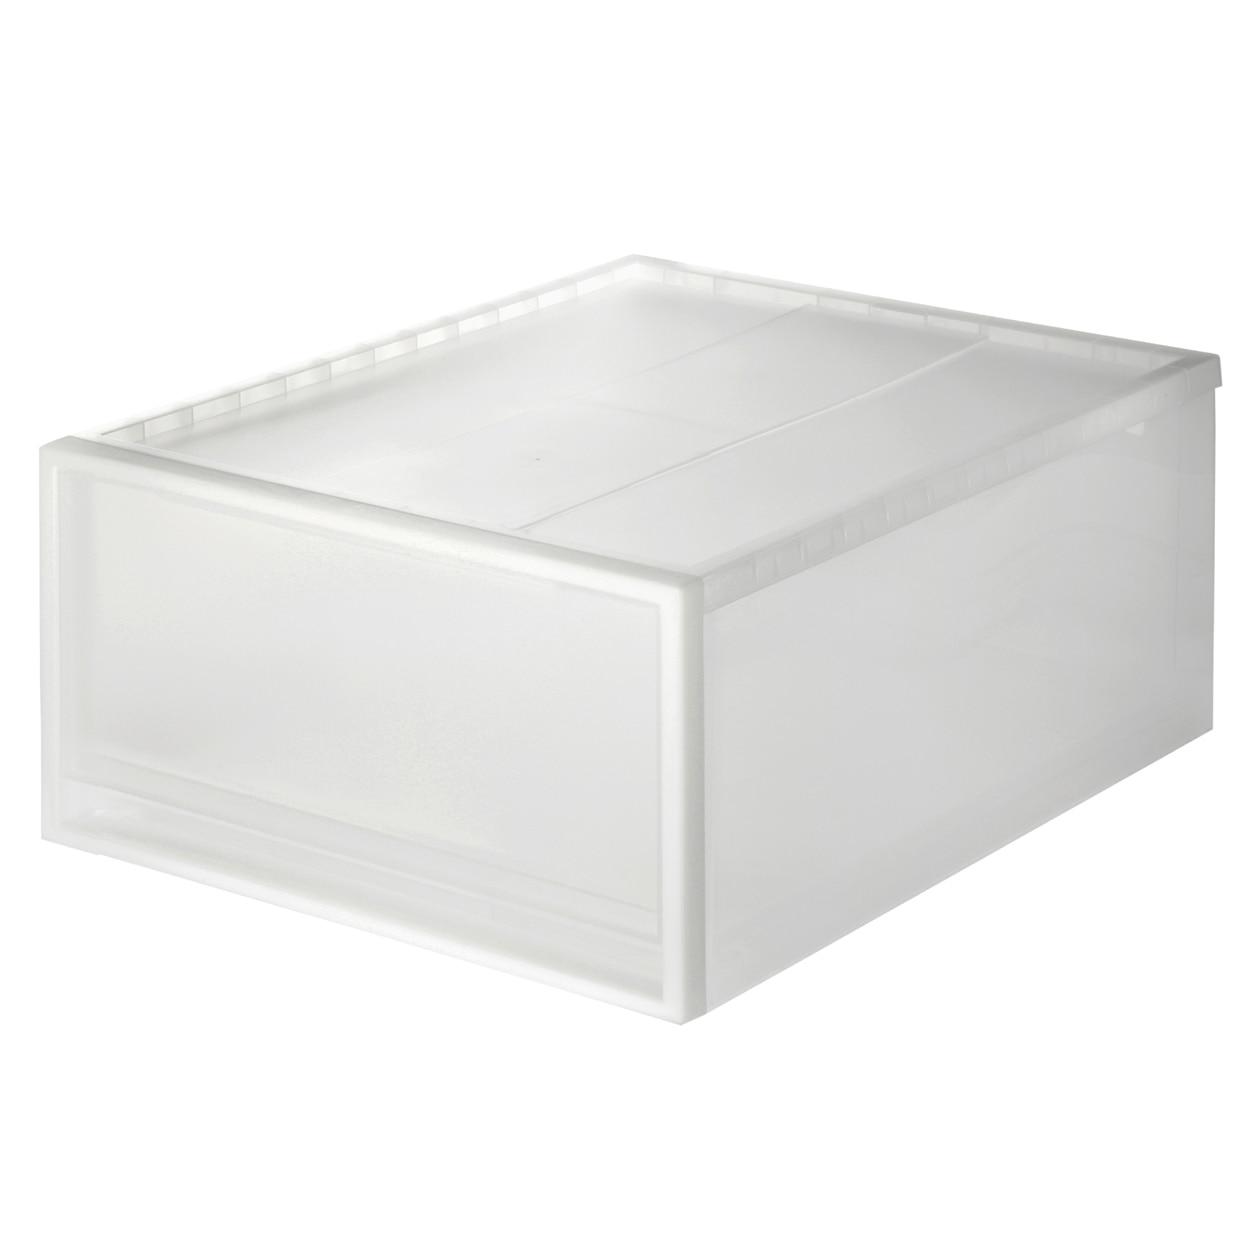 RoomClip商品情報 - 【宅送】PPクローゼットケース引出式・大